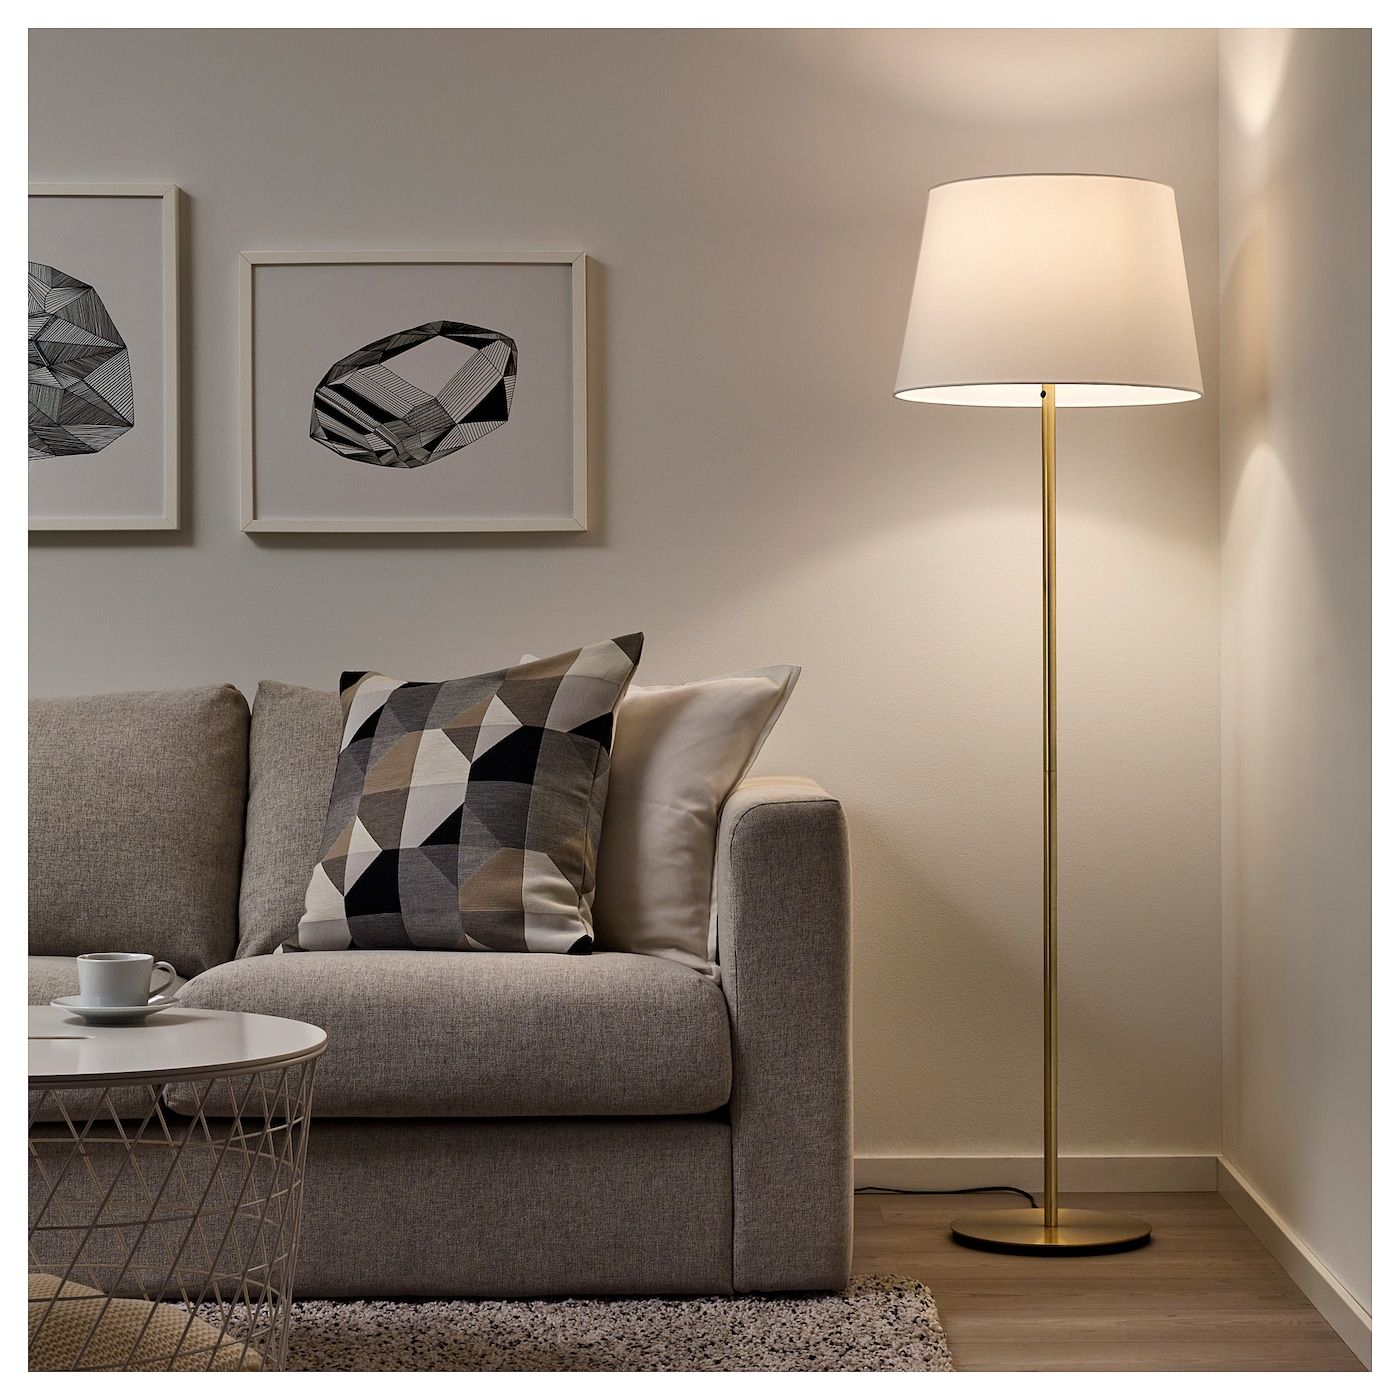 Ikea Skaftet Base Per Lampada Da Terra Lampade Da Terra Soggiorno Lampade Da Terra Con Paralume Lampade Da Terra Ikea